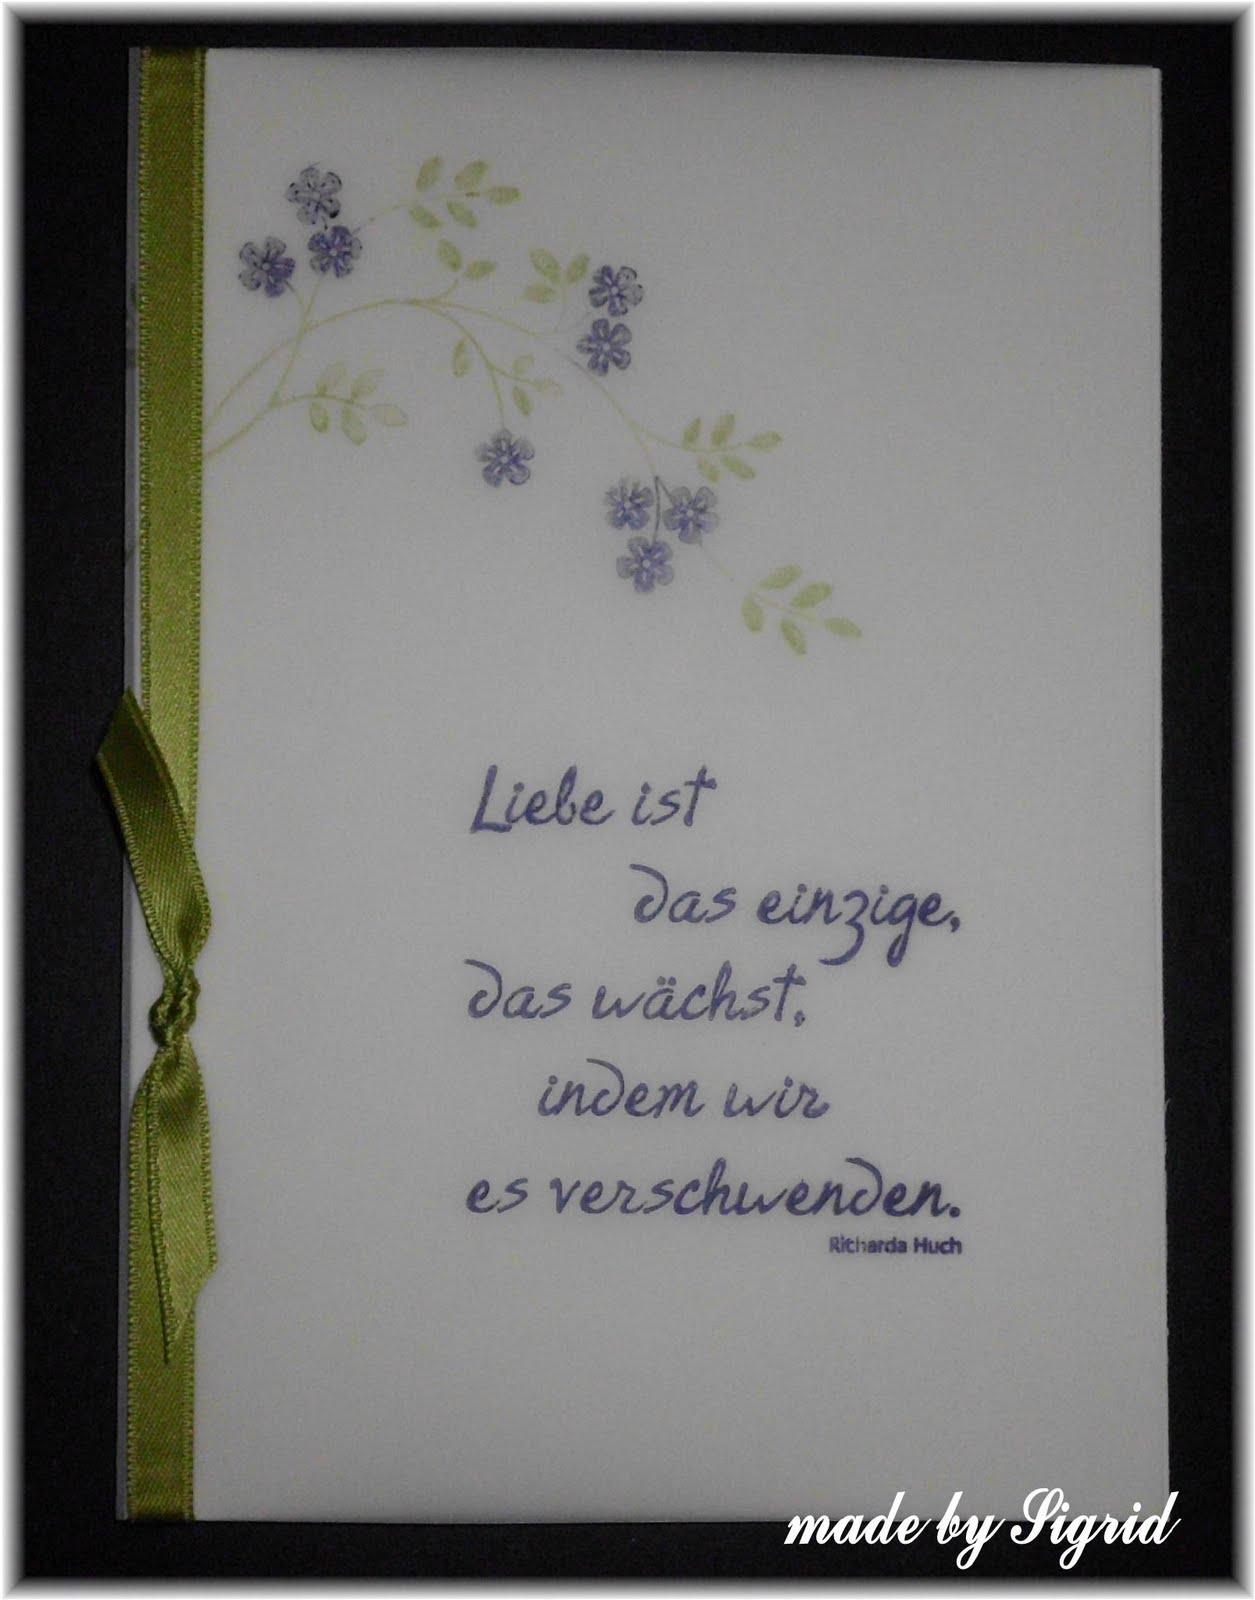 sigrids kreative art â stampin up ideenblog fà r mà nster und